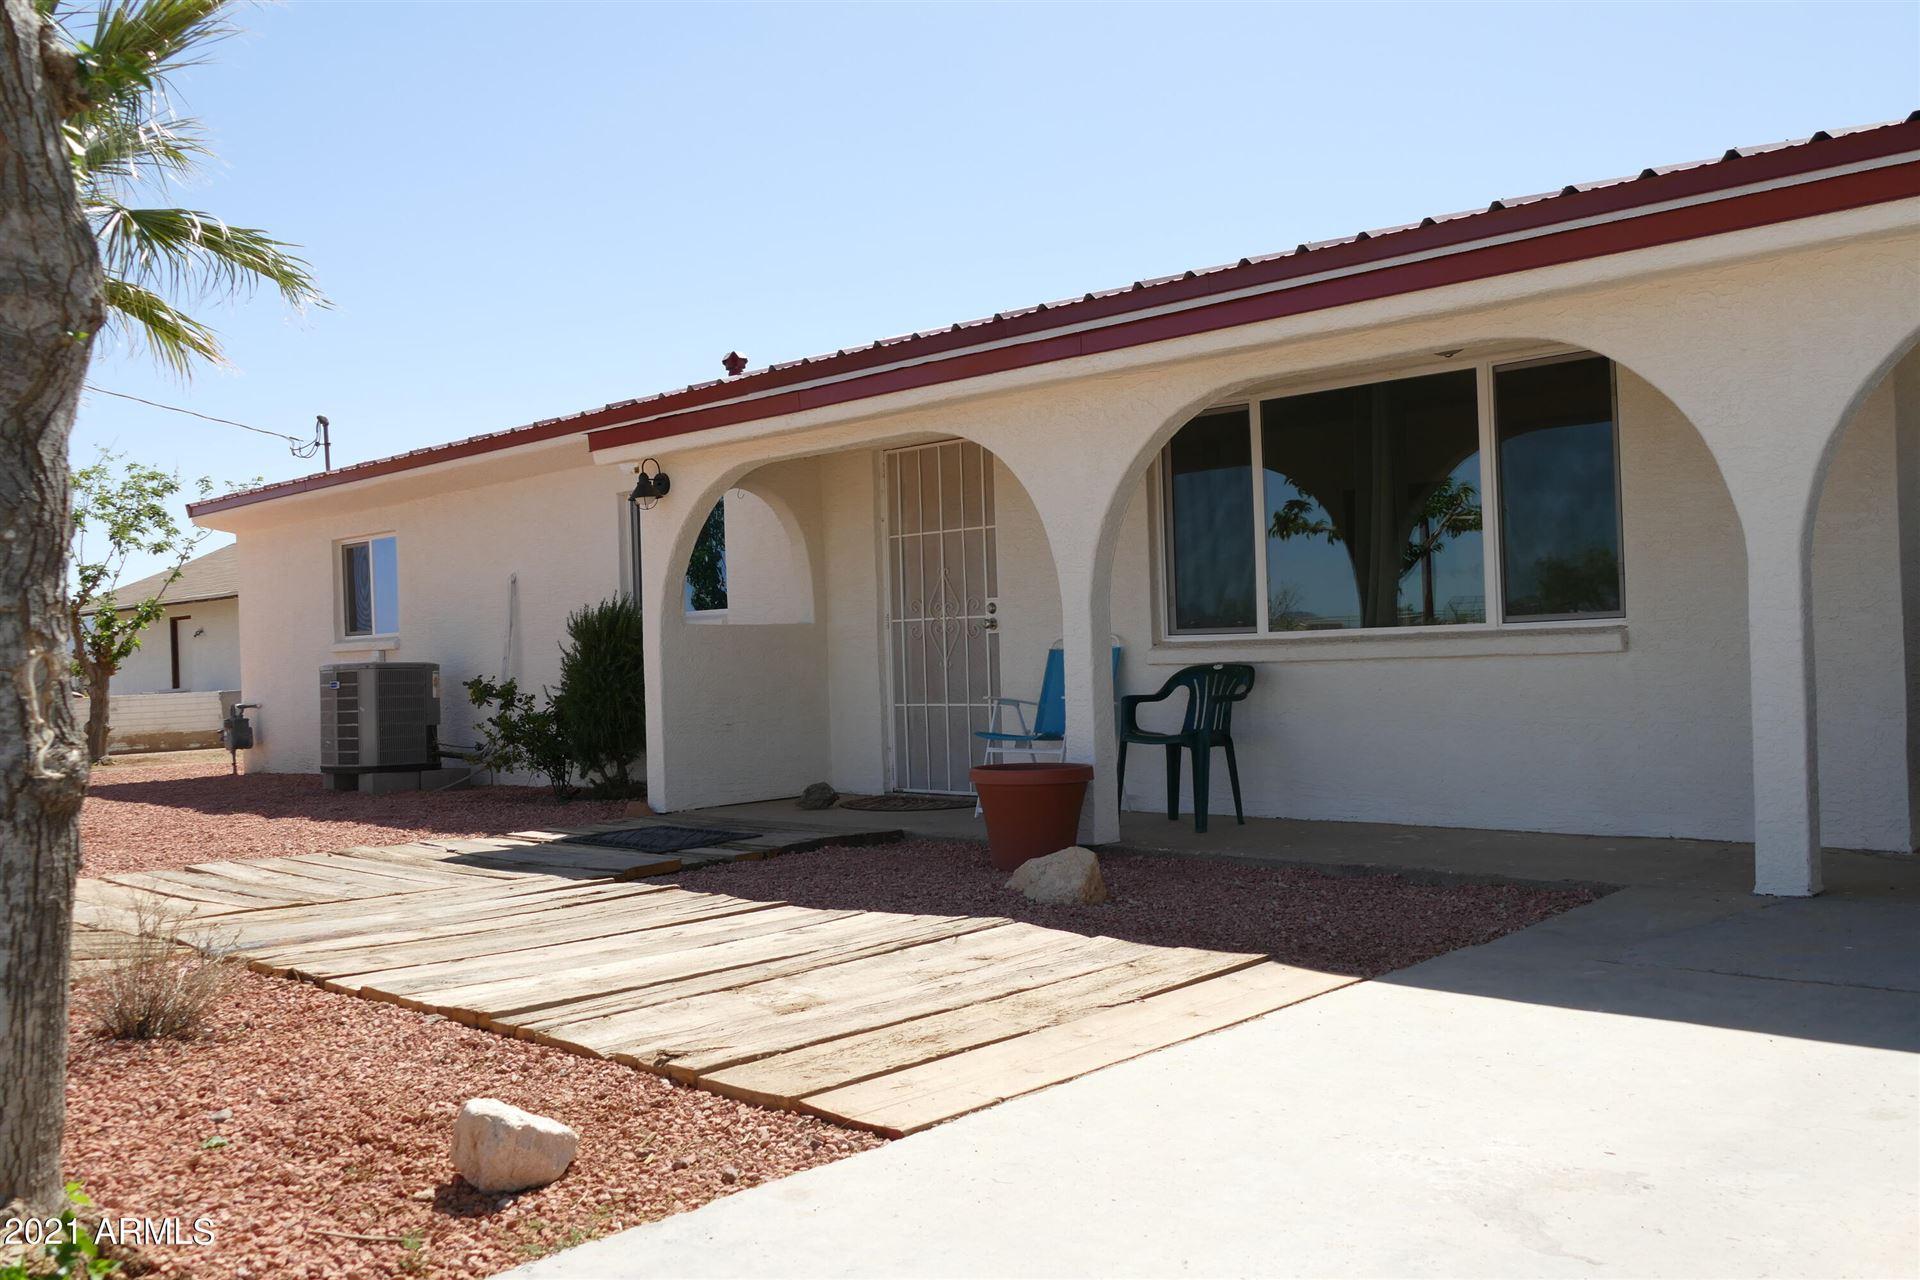 Photo of 50027 N EAGLE Street, Aguila, AZ 85320 (MLS # 6232539)